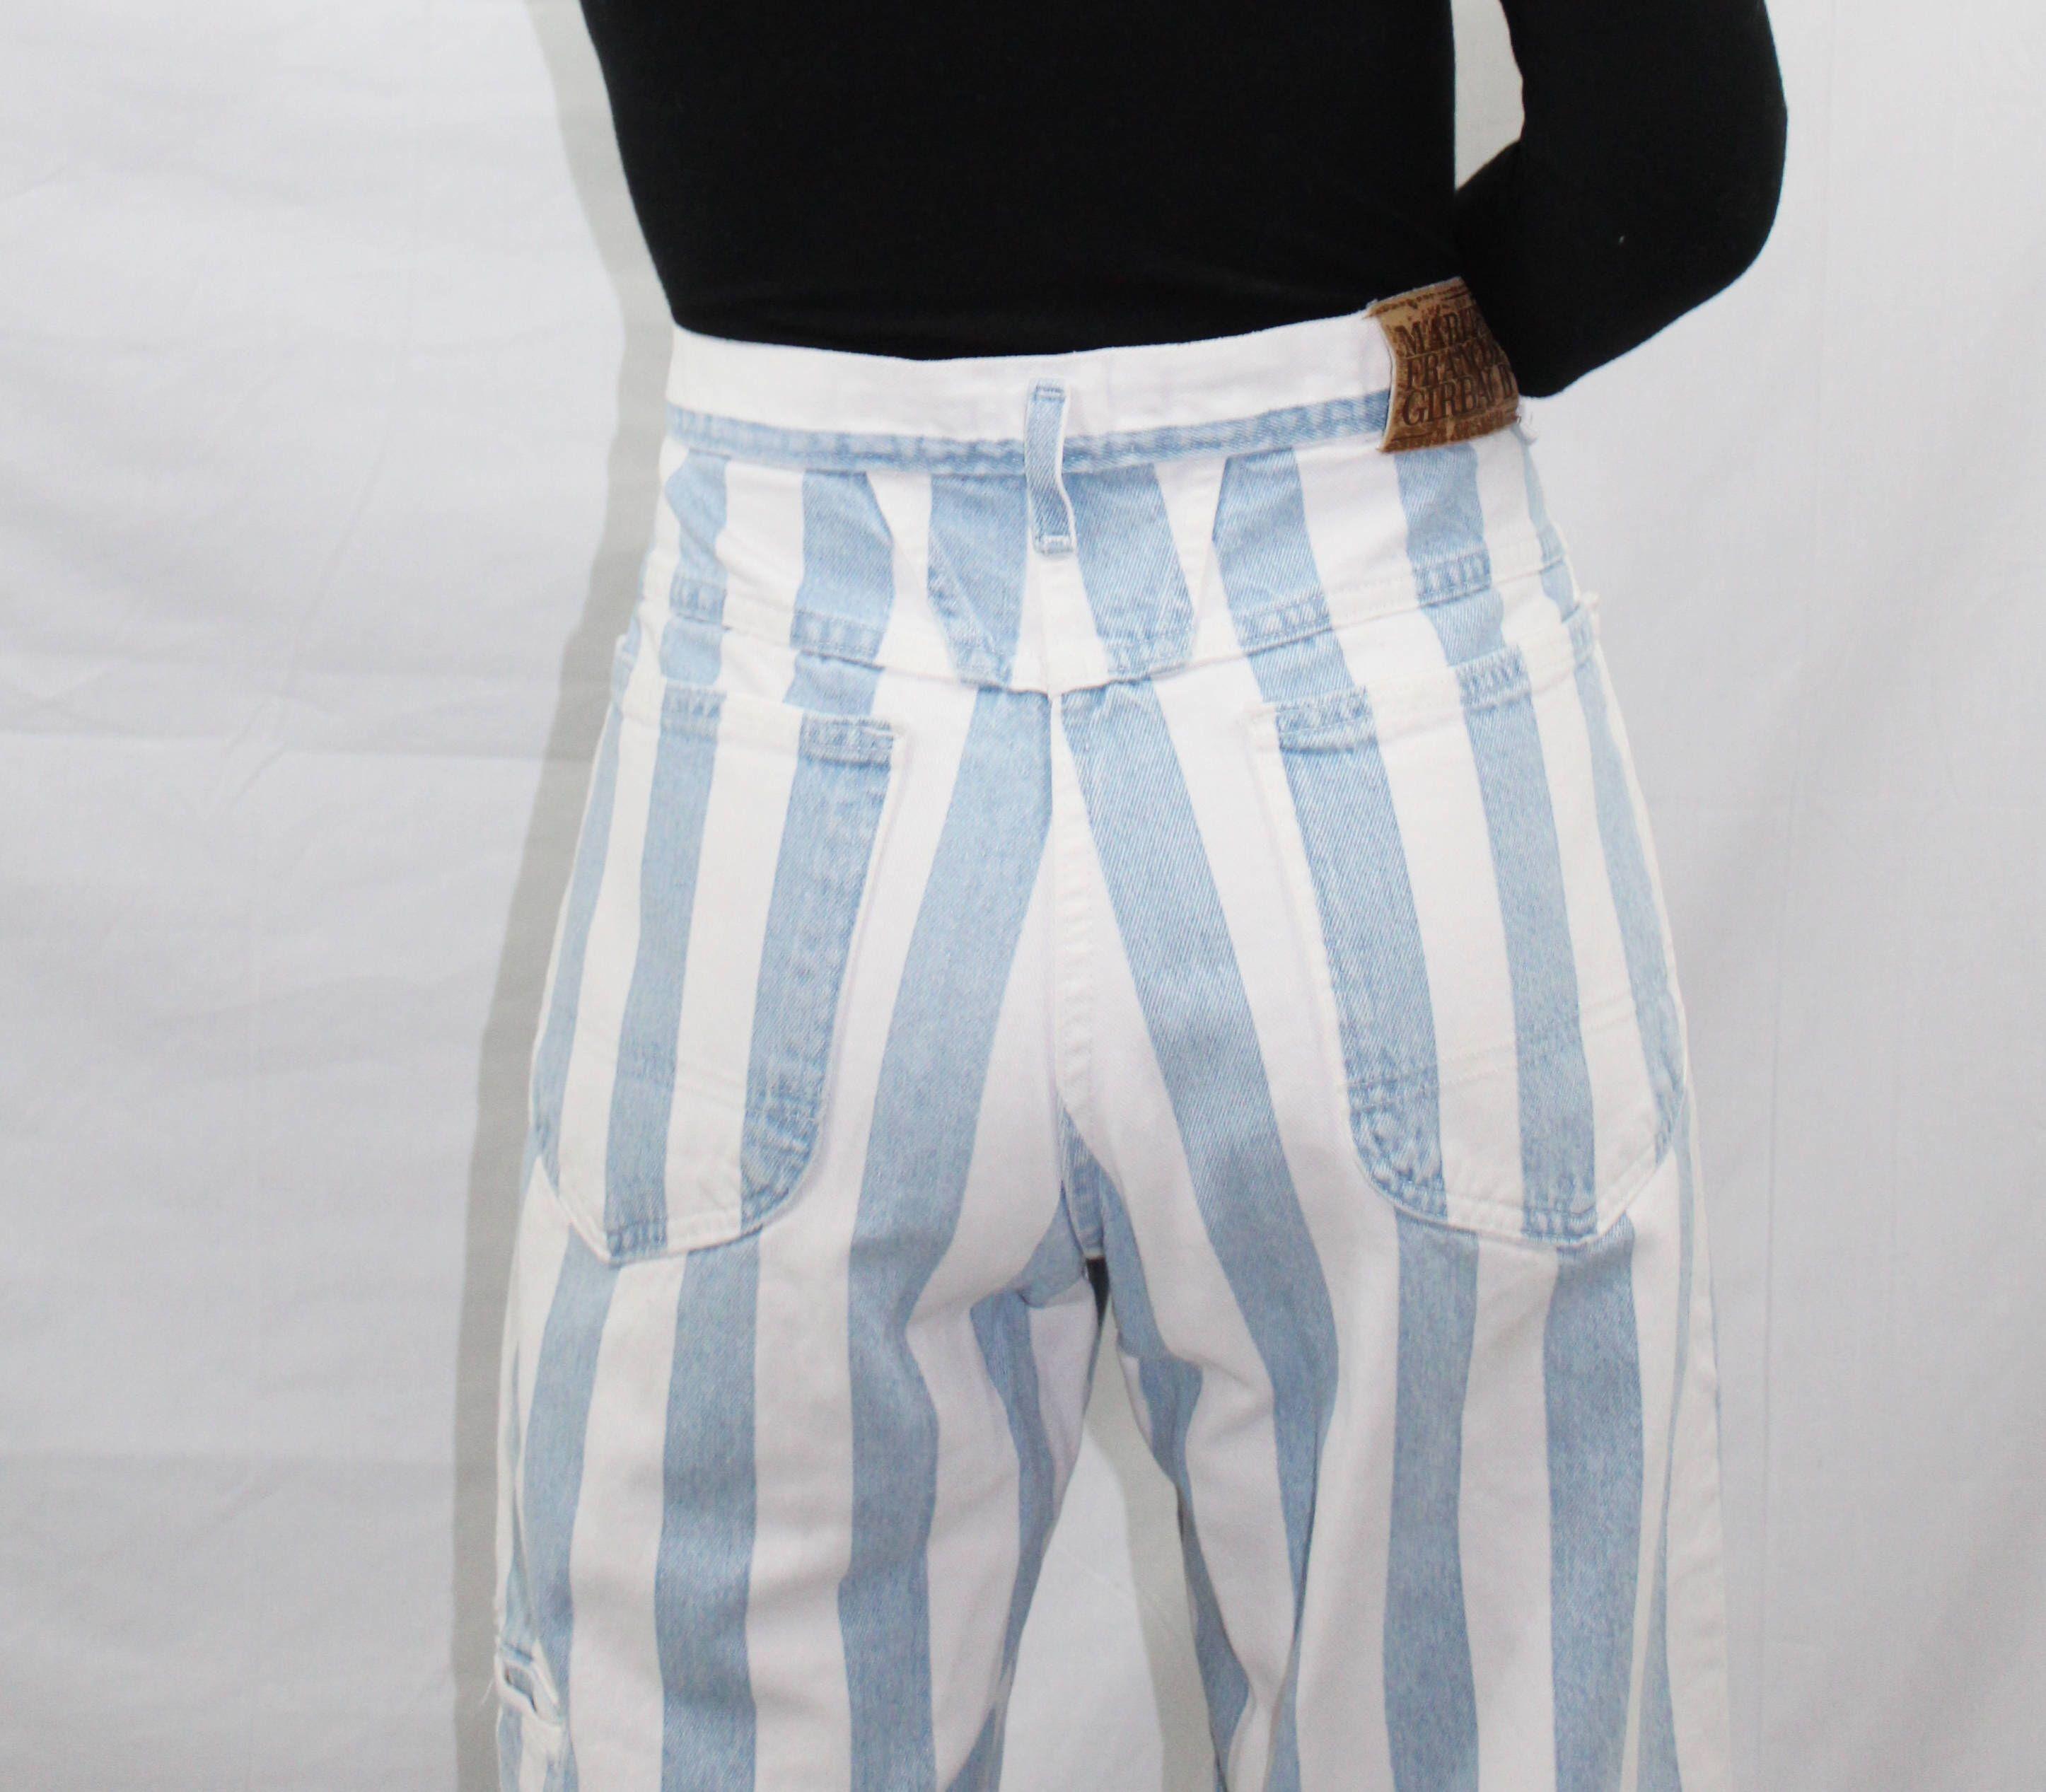 Anthropologie Elevenses Striped Wide Leg Palazzo Pants Sz L Sturdy Construction Pants Women's Clothing